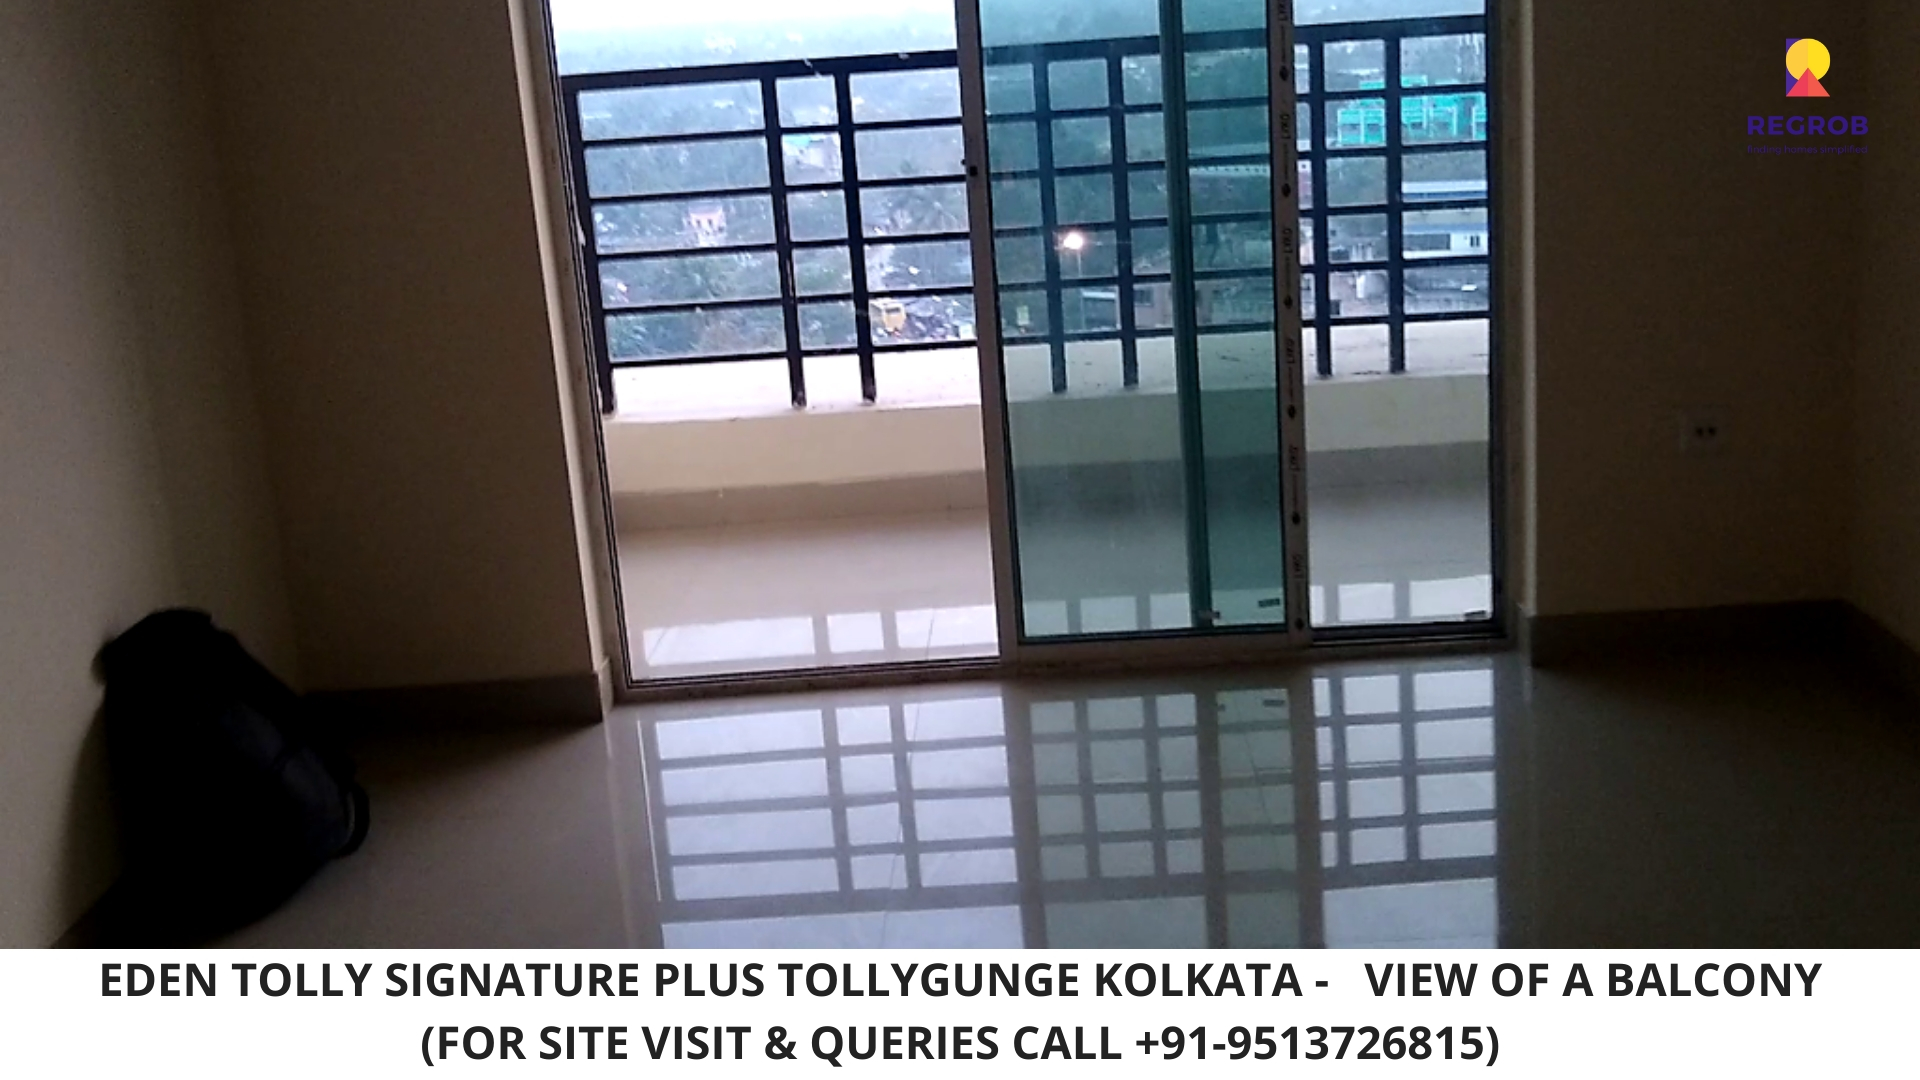 Eden Tolly Signature Plus Tollygunge Kolkata